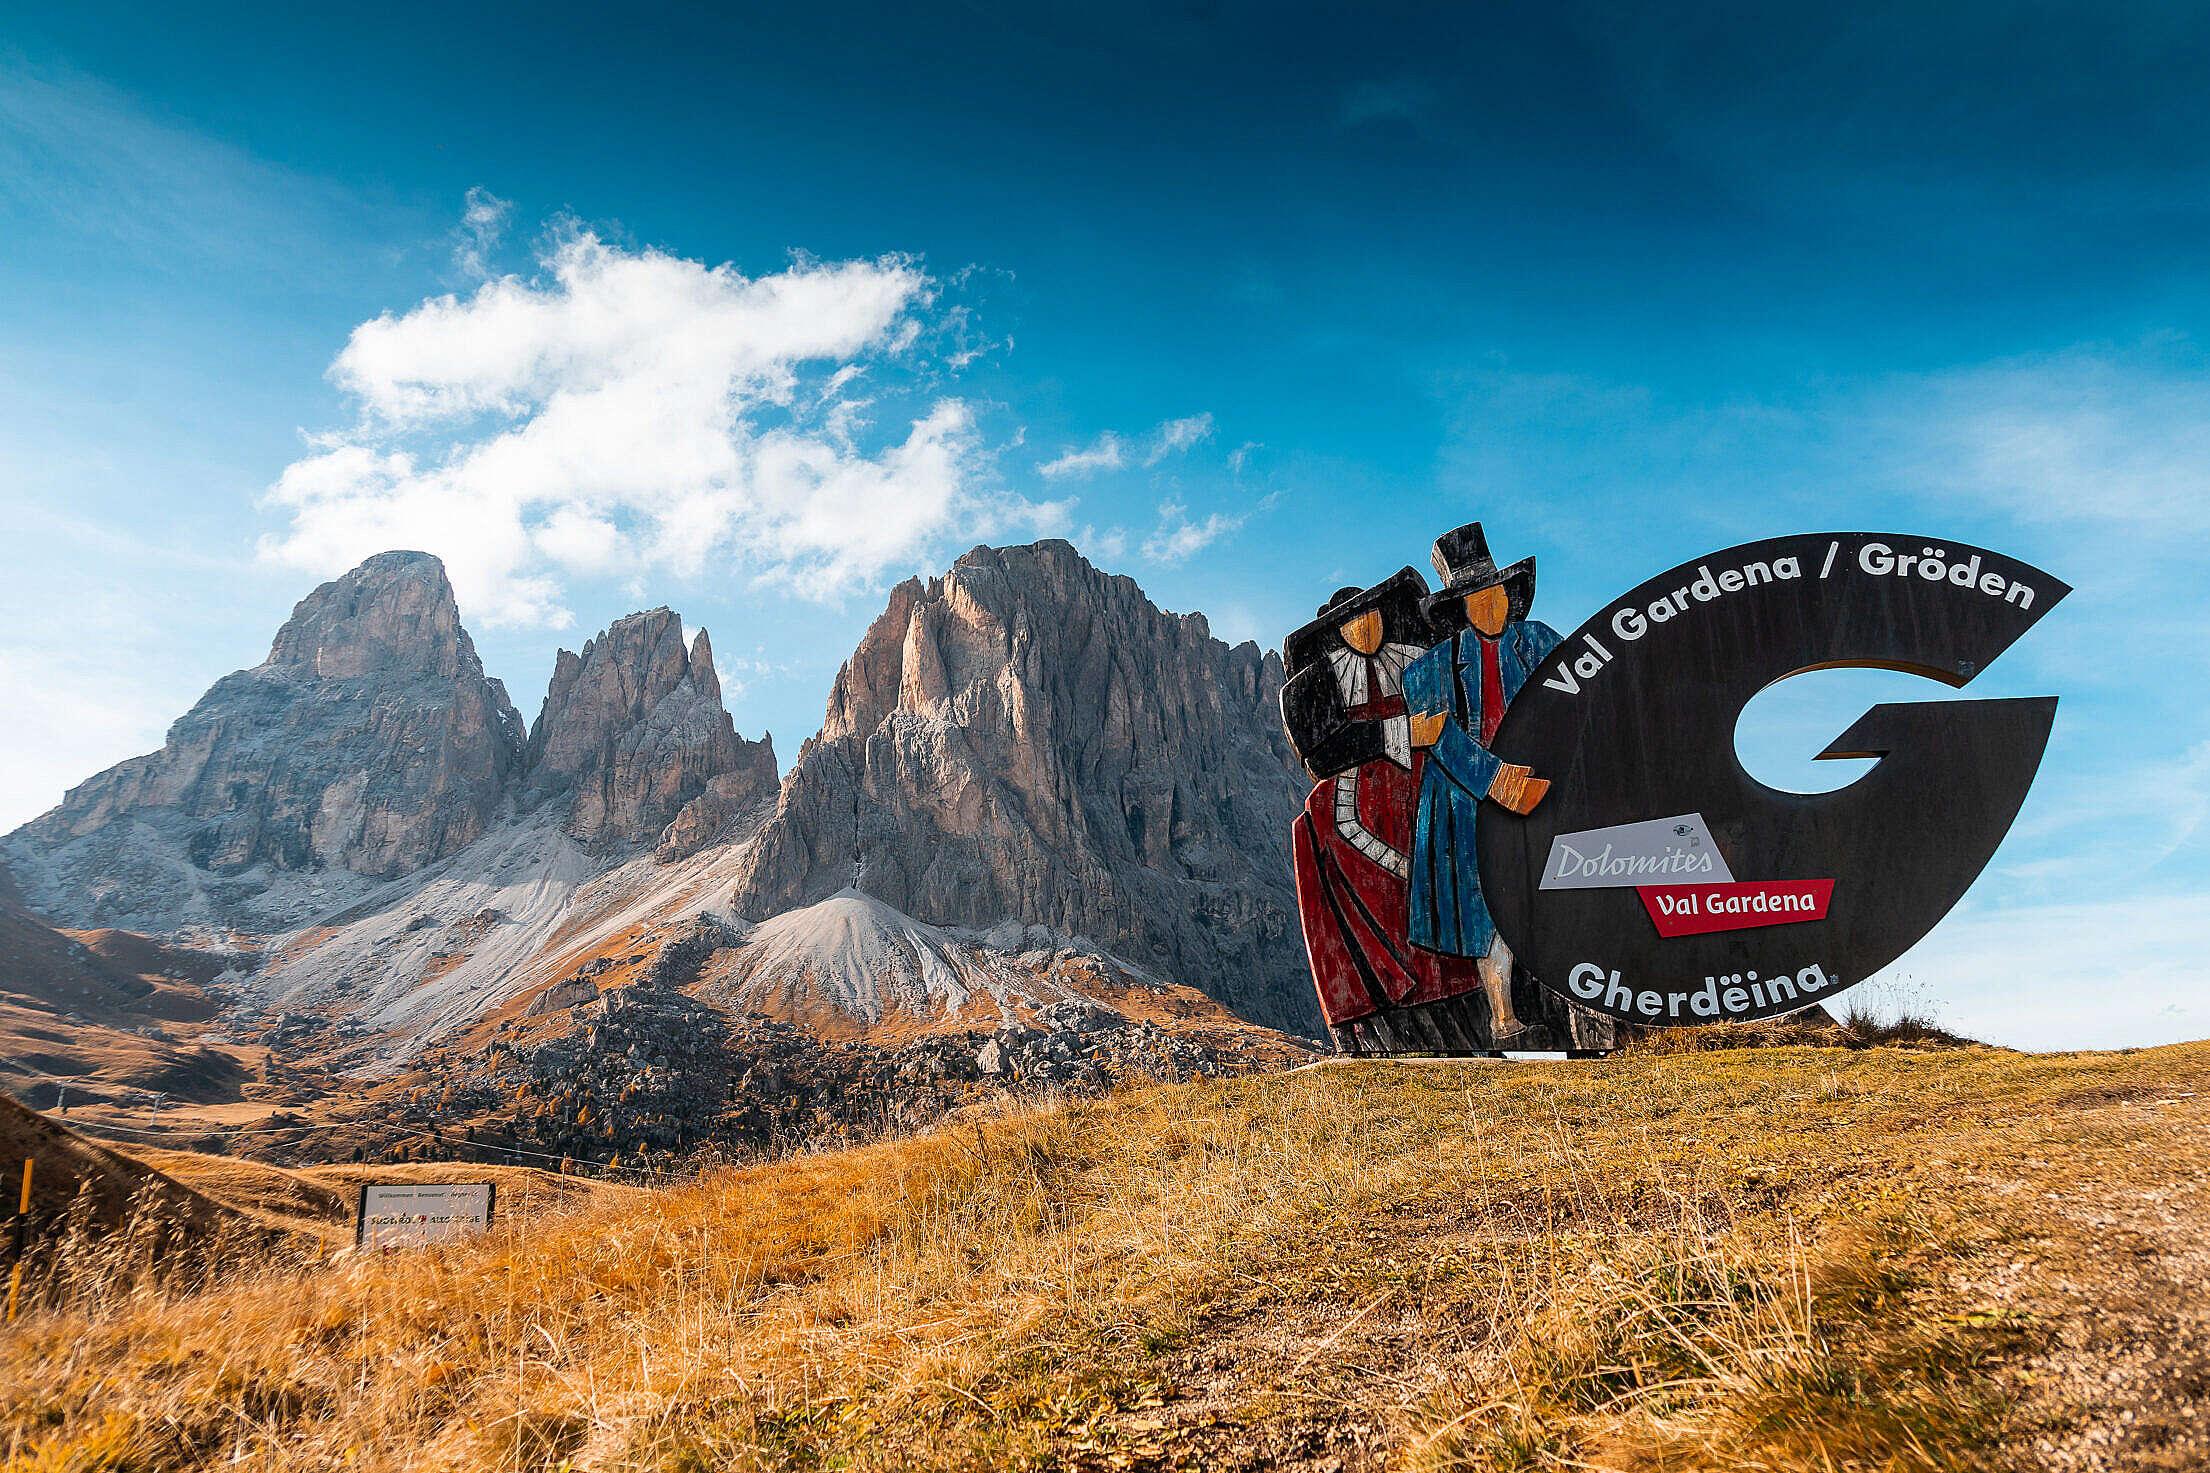 Val Gardena in Dolomites, Italy Free Stock Photo